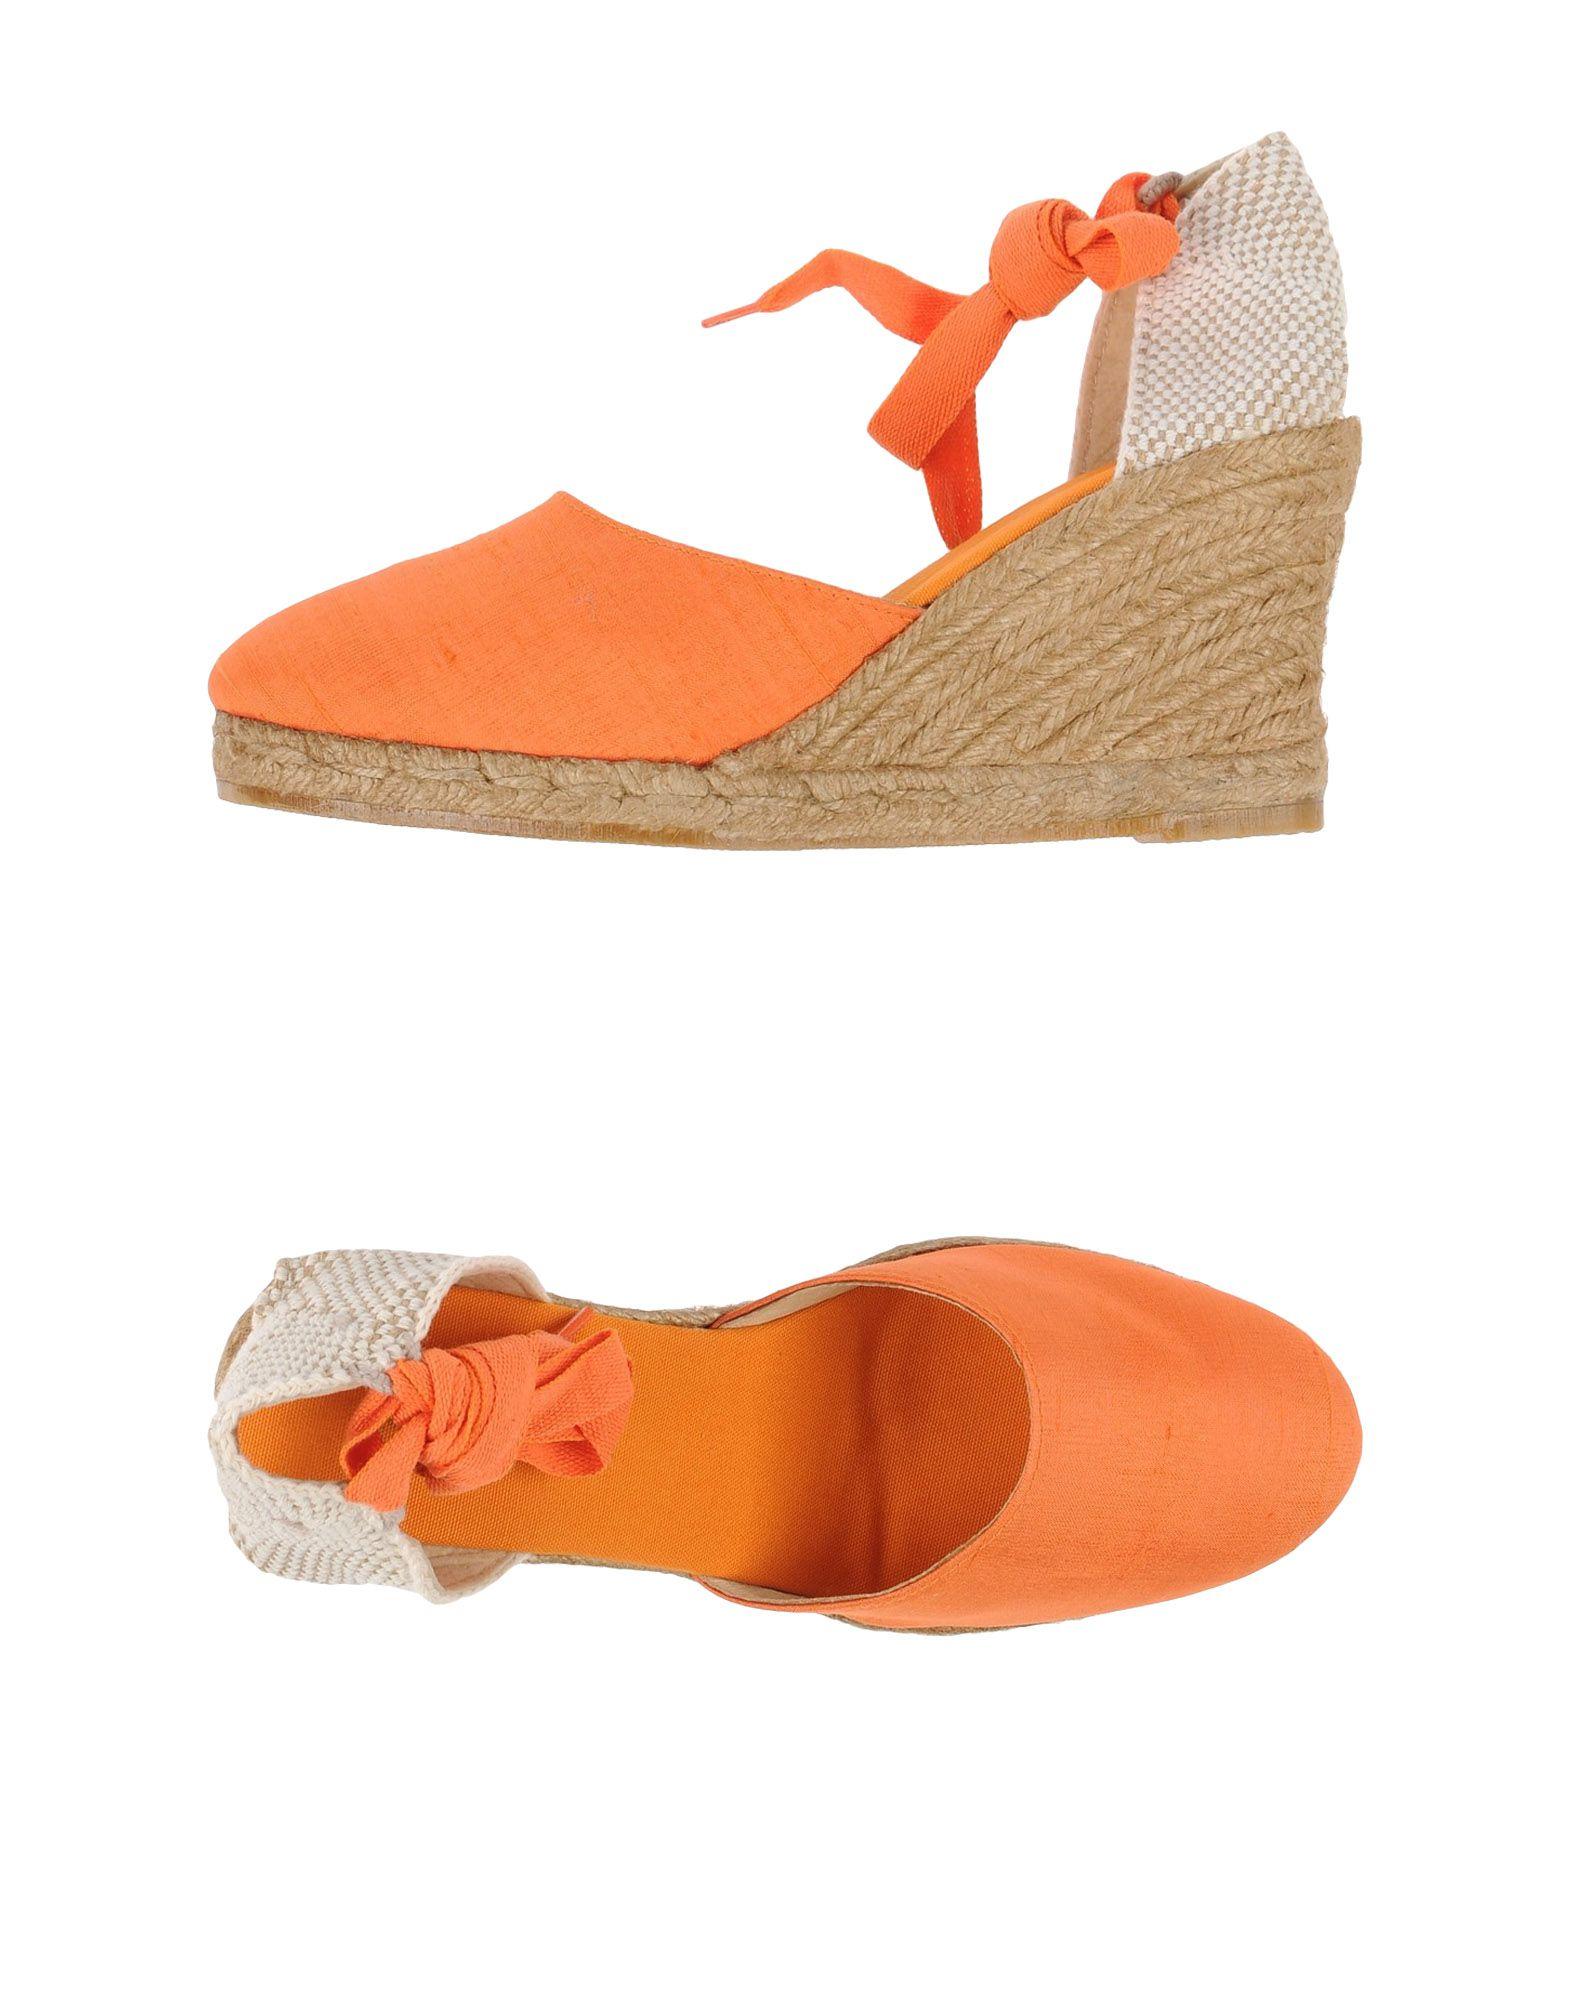 Orange Wedge Heel Shoes